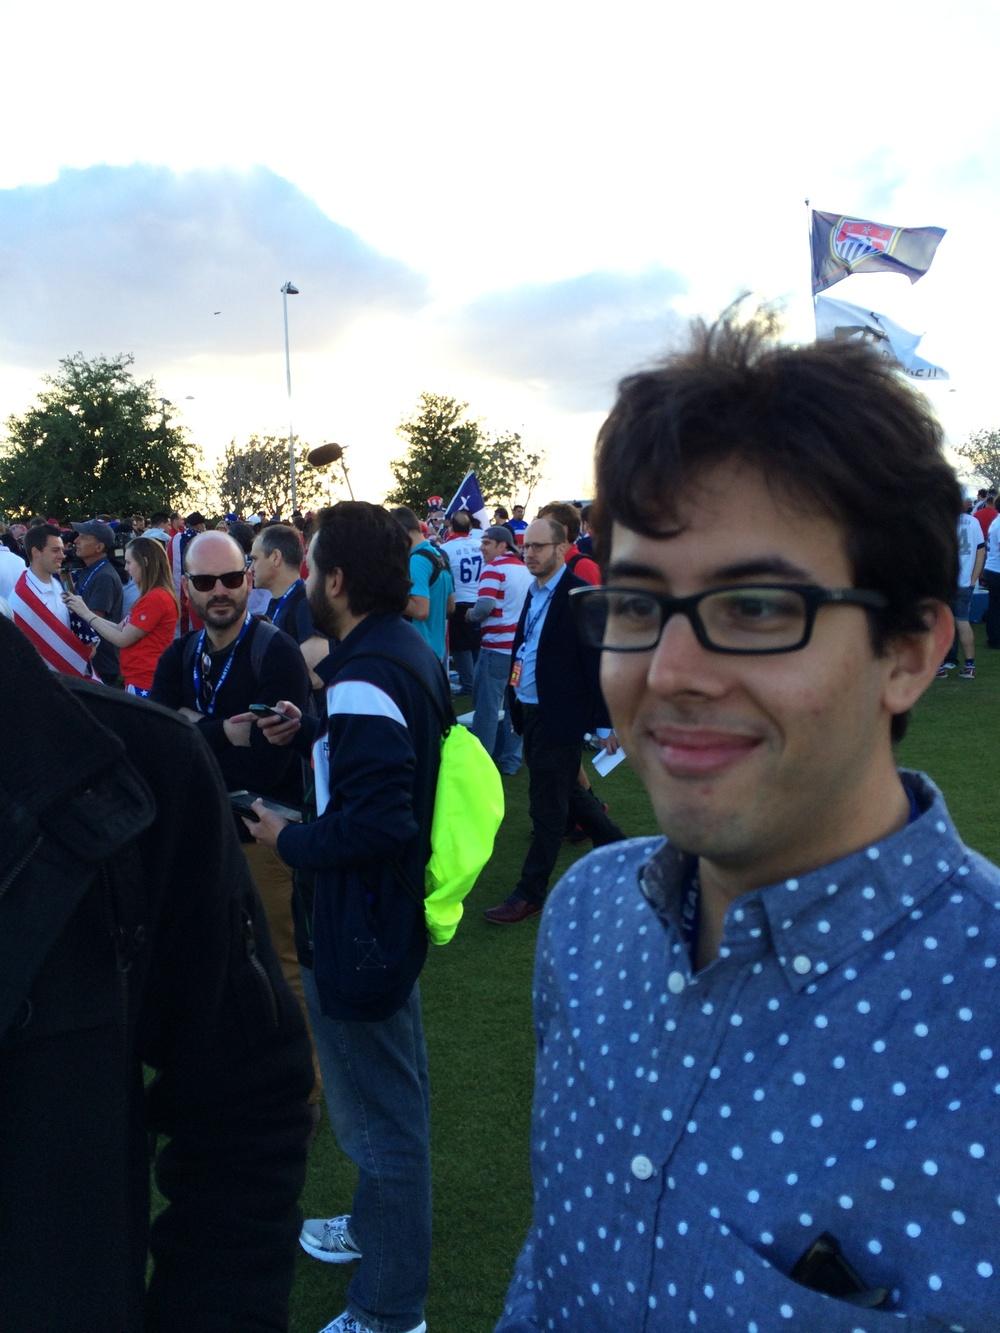 foreground: Adam Serrano, mid-ground: Chris Thomas, background: Rog Bennet